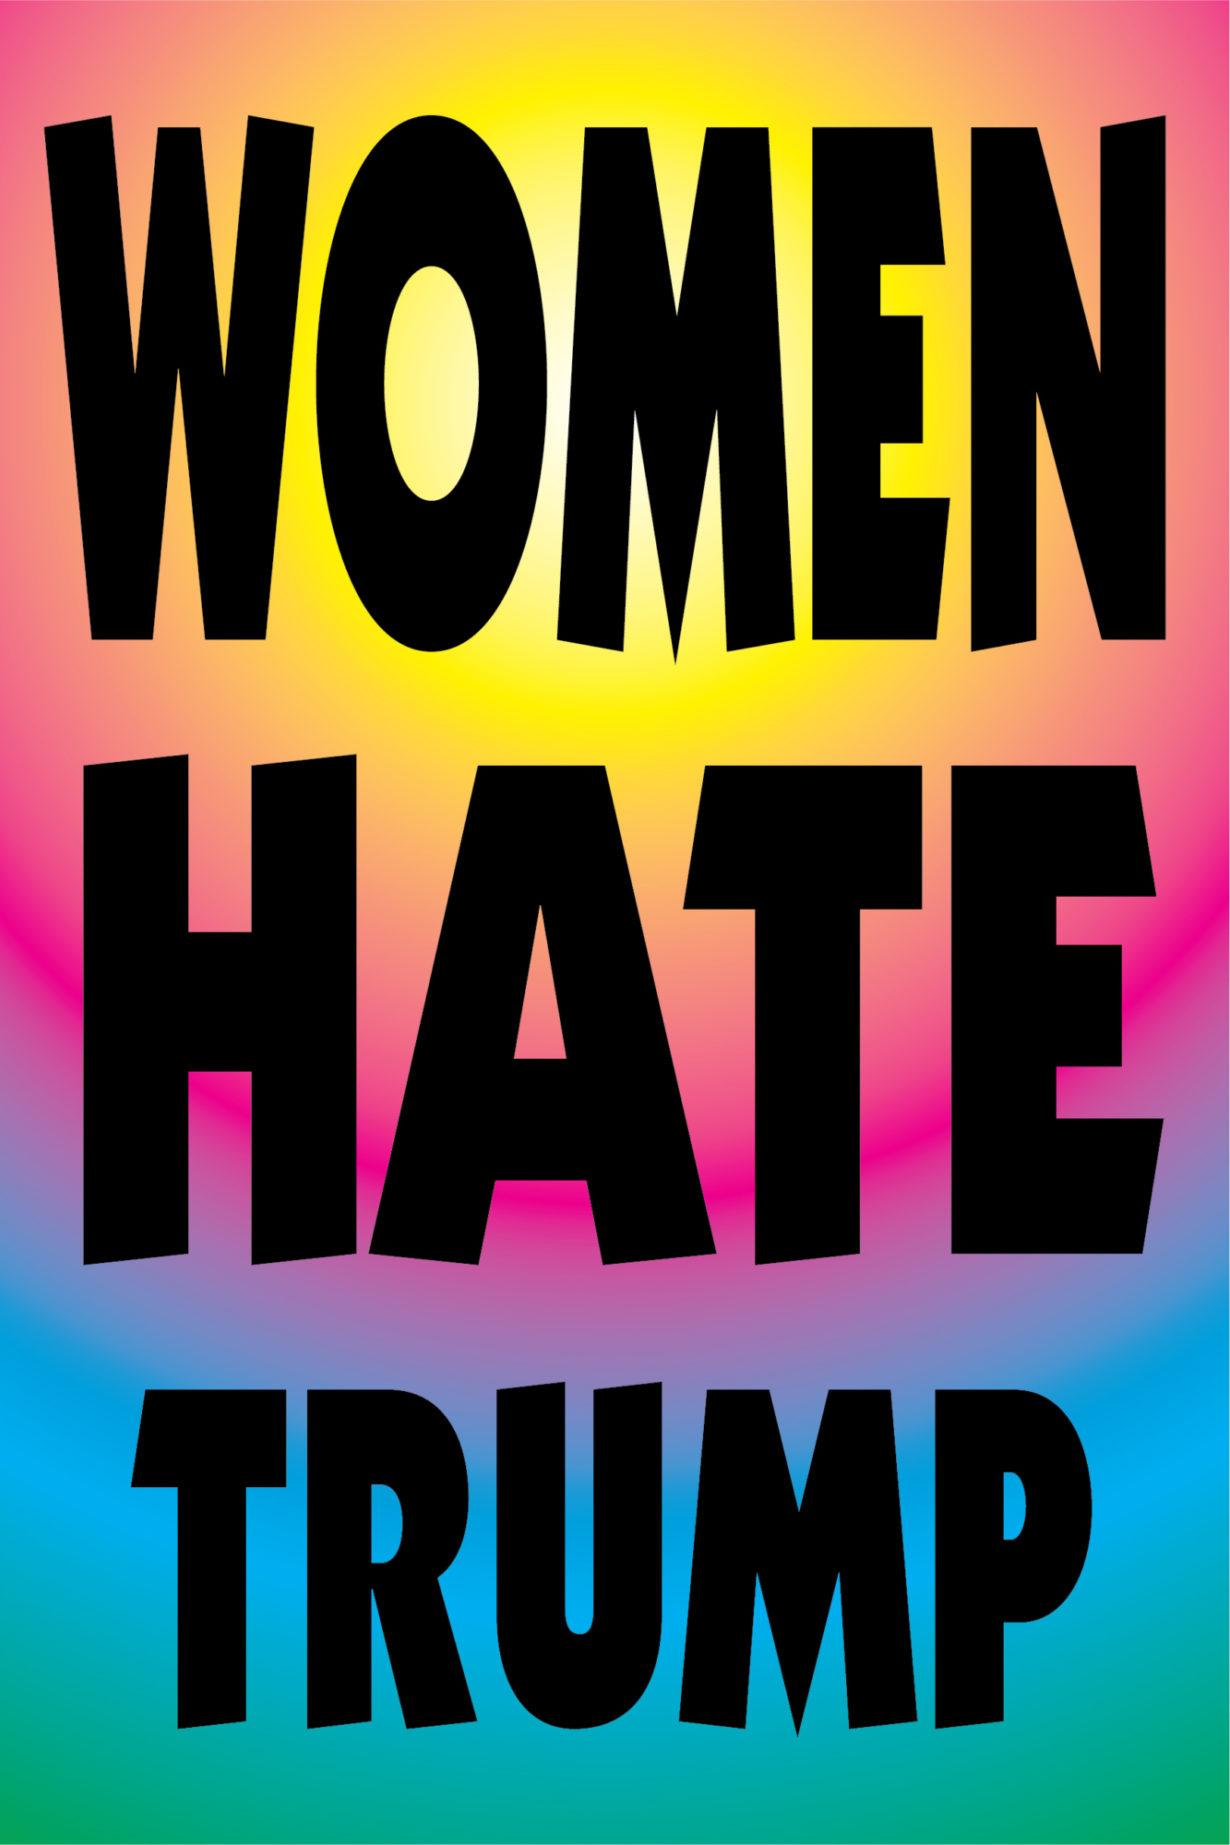 NP_51_75_2017_Women-Hate-Trump.jpg